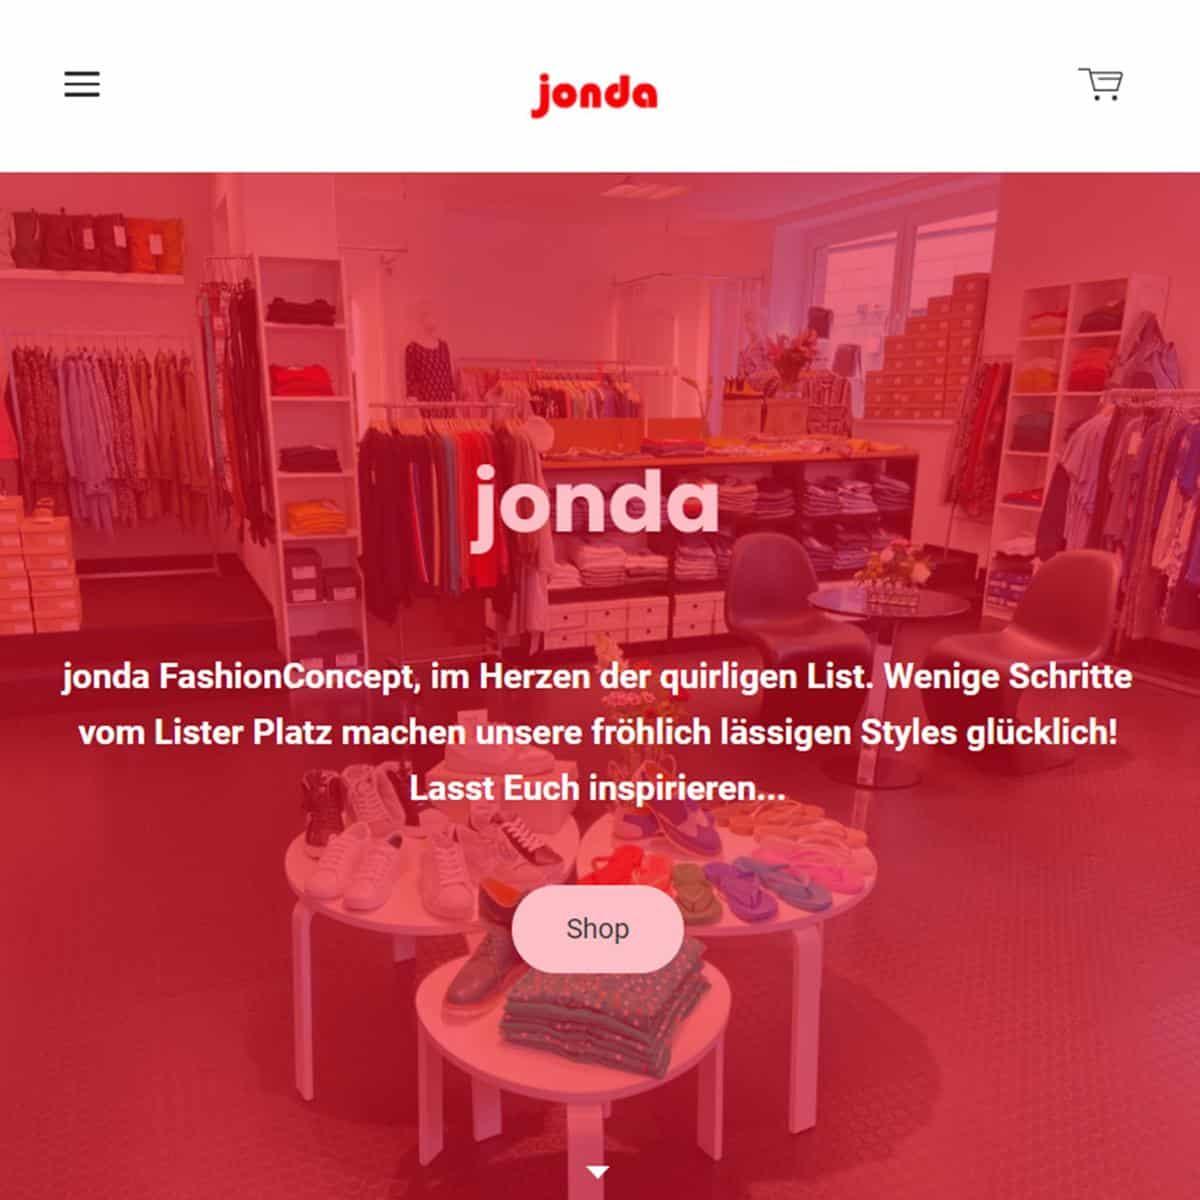 Style Hannover Jonda Fashion Concept Online Shop B - Jonda Fashion Concept - ONLINE Shop